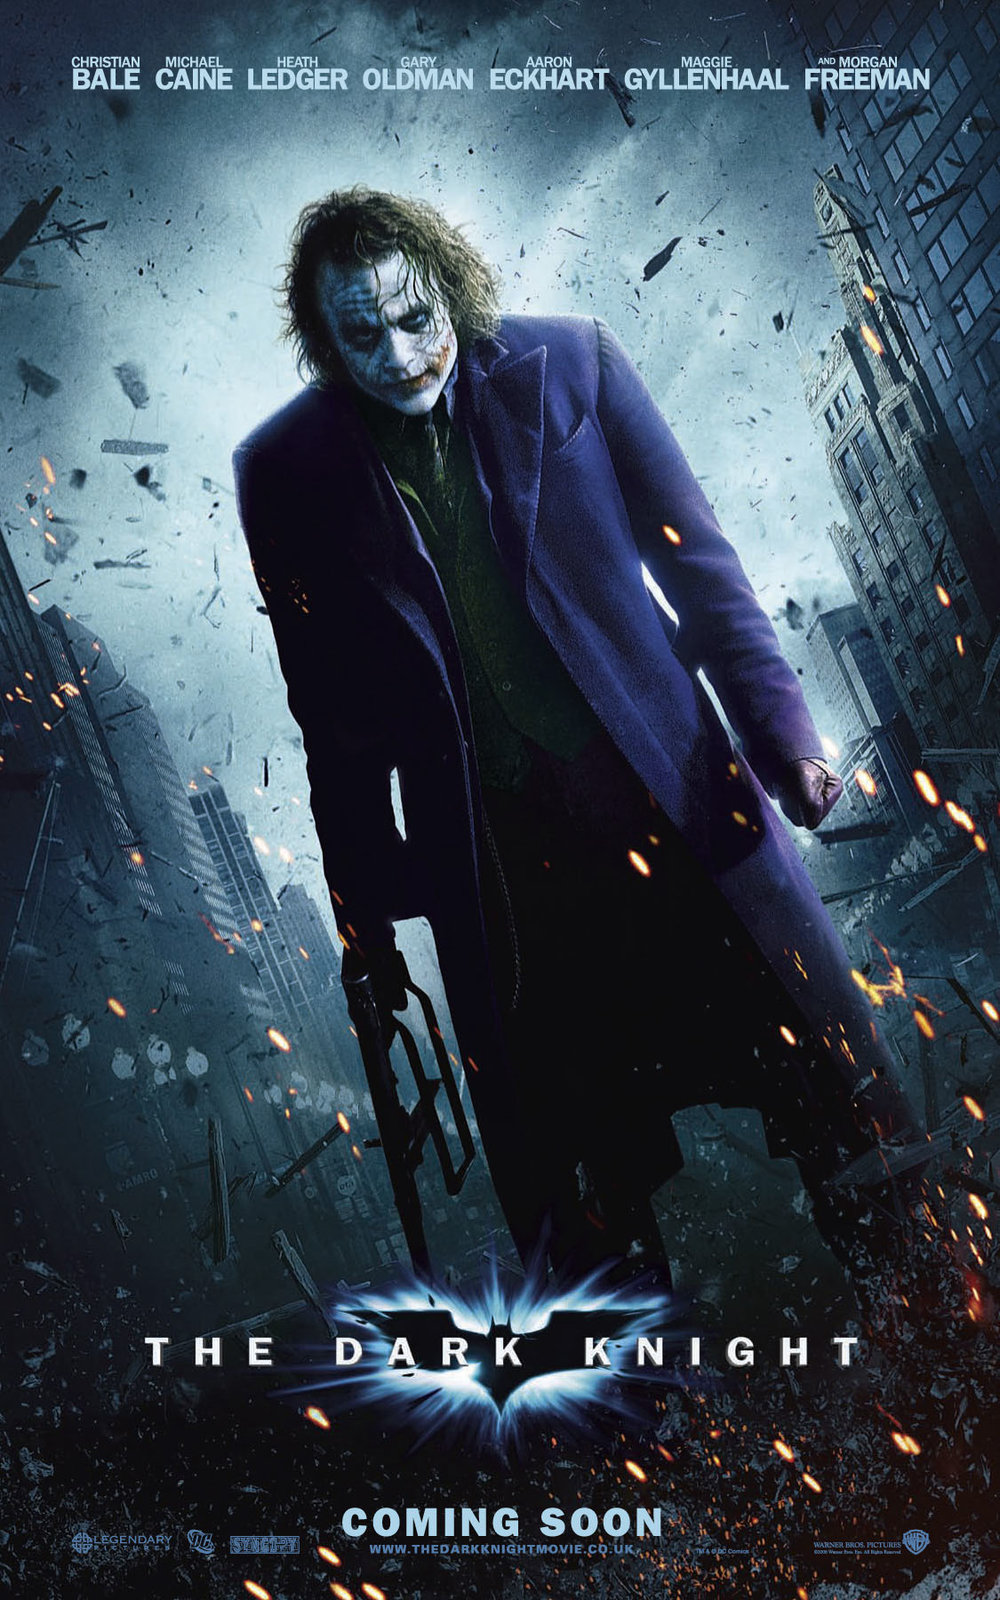 tdk-may17-joker-poster-large.jpg